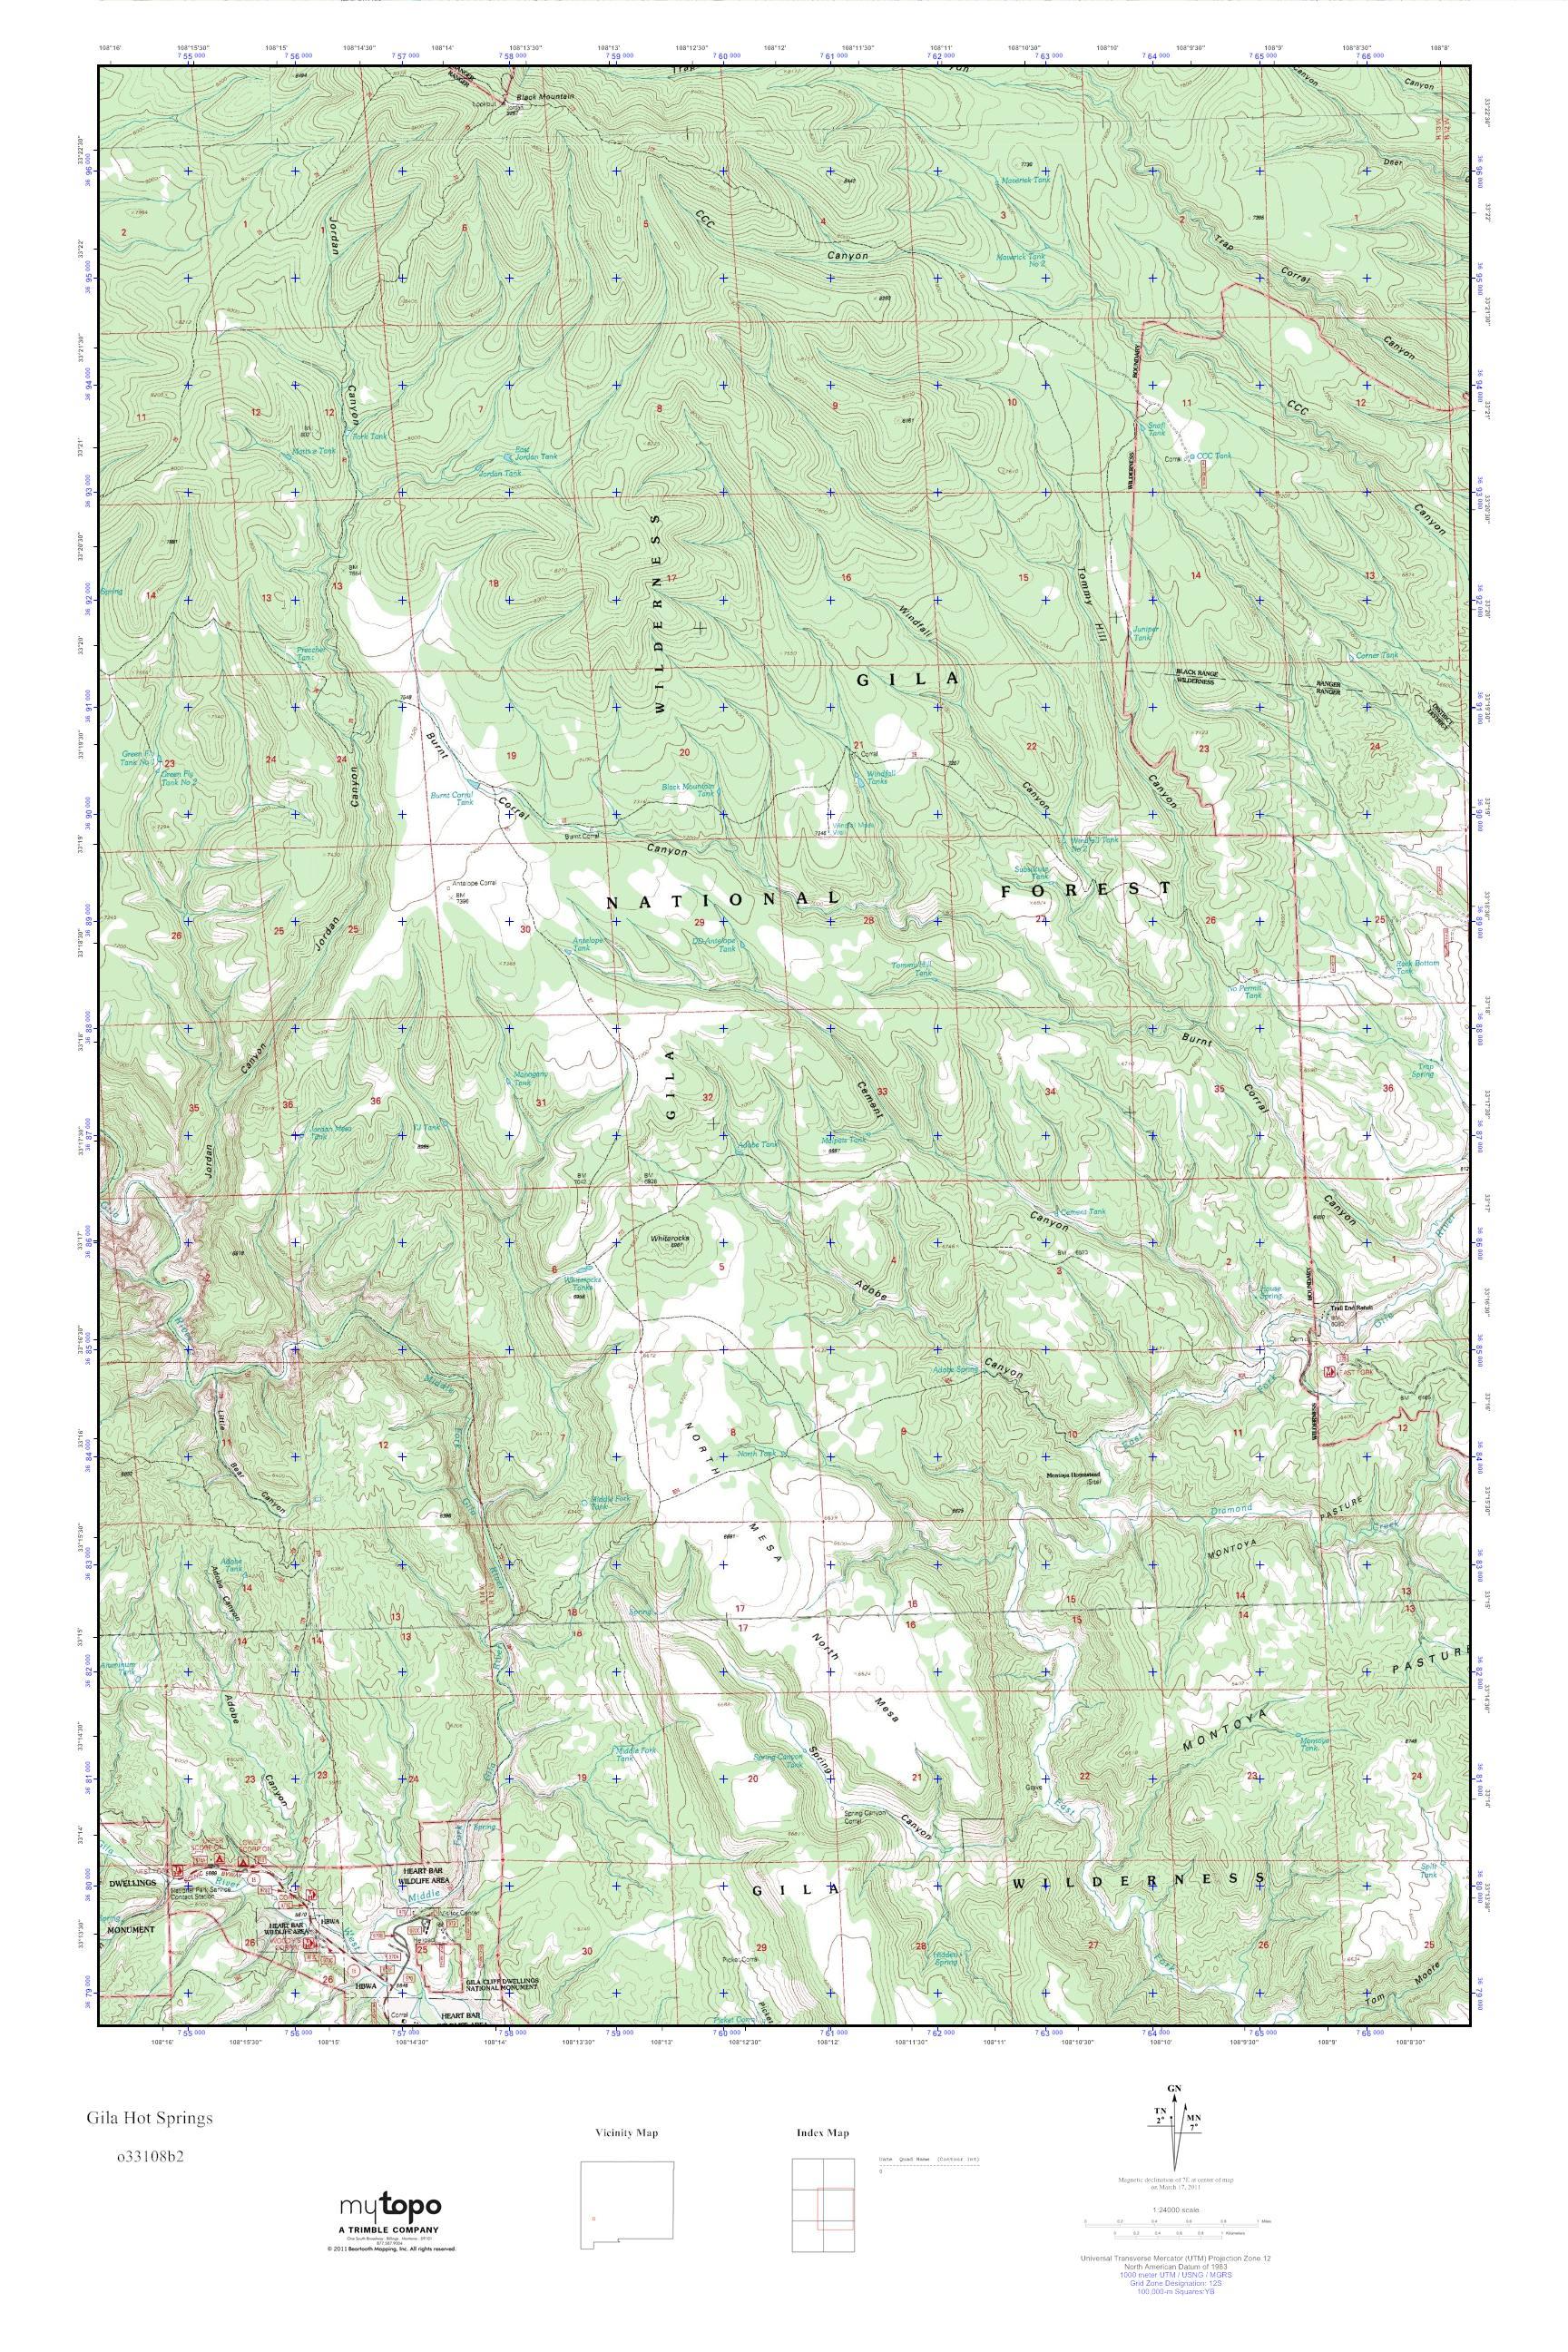 MyTopo Gila Hot Springs, New Mexico USGS Quad Topo Map